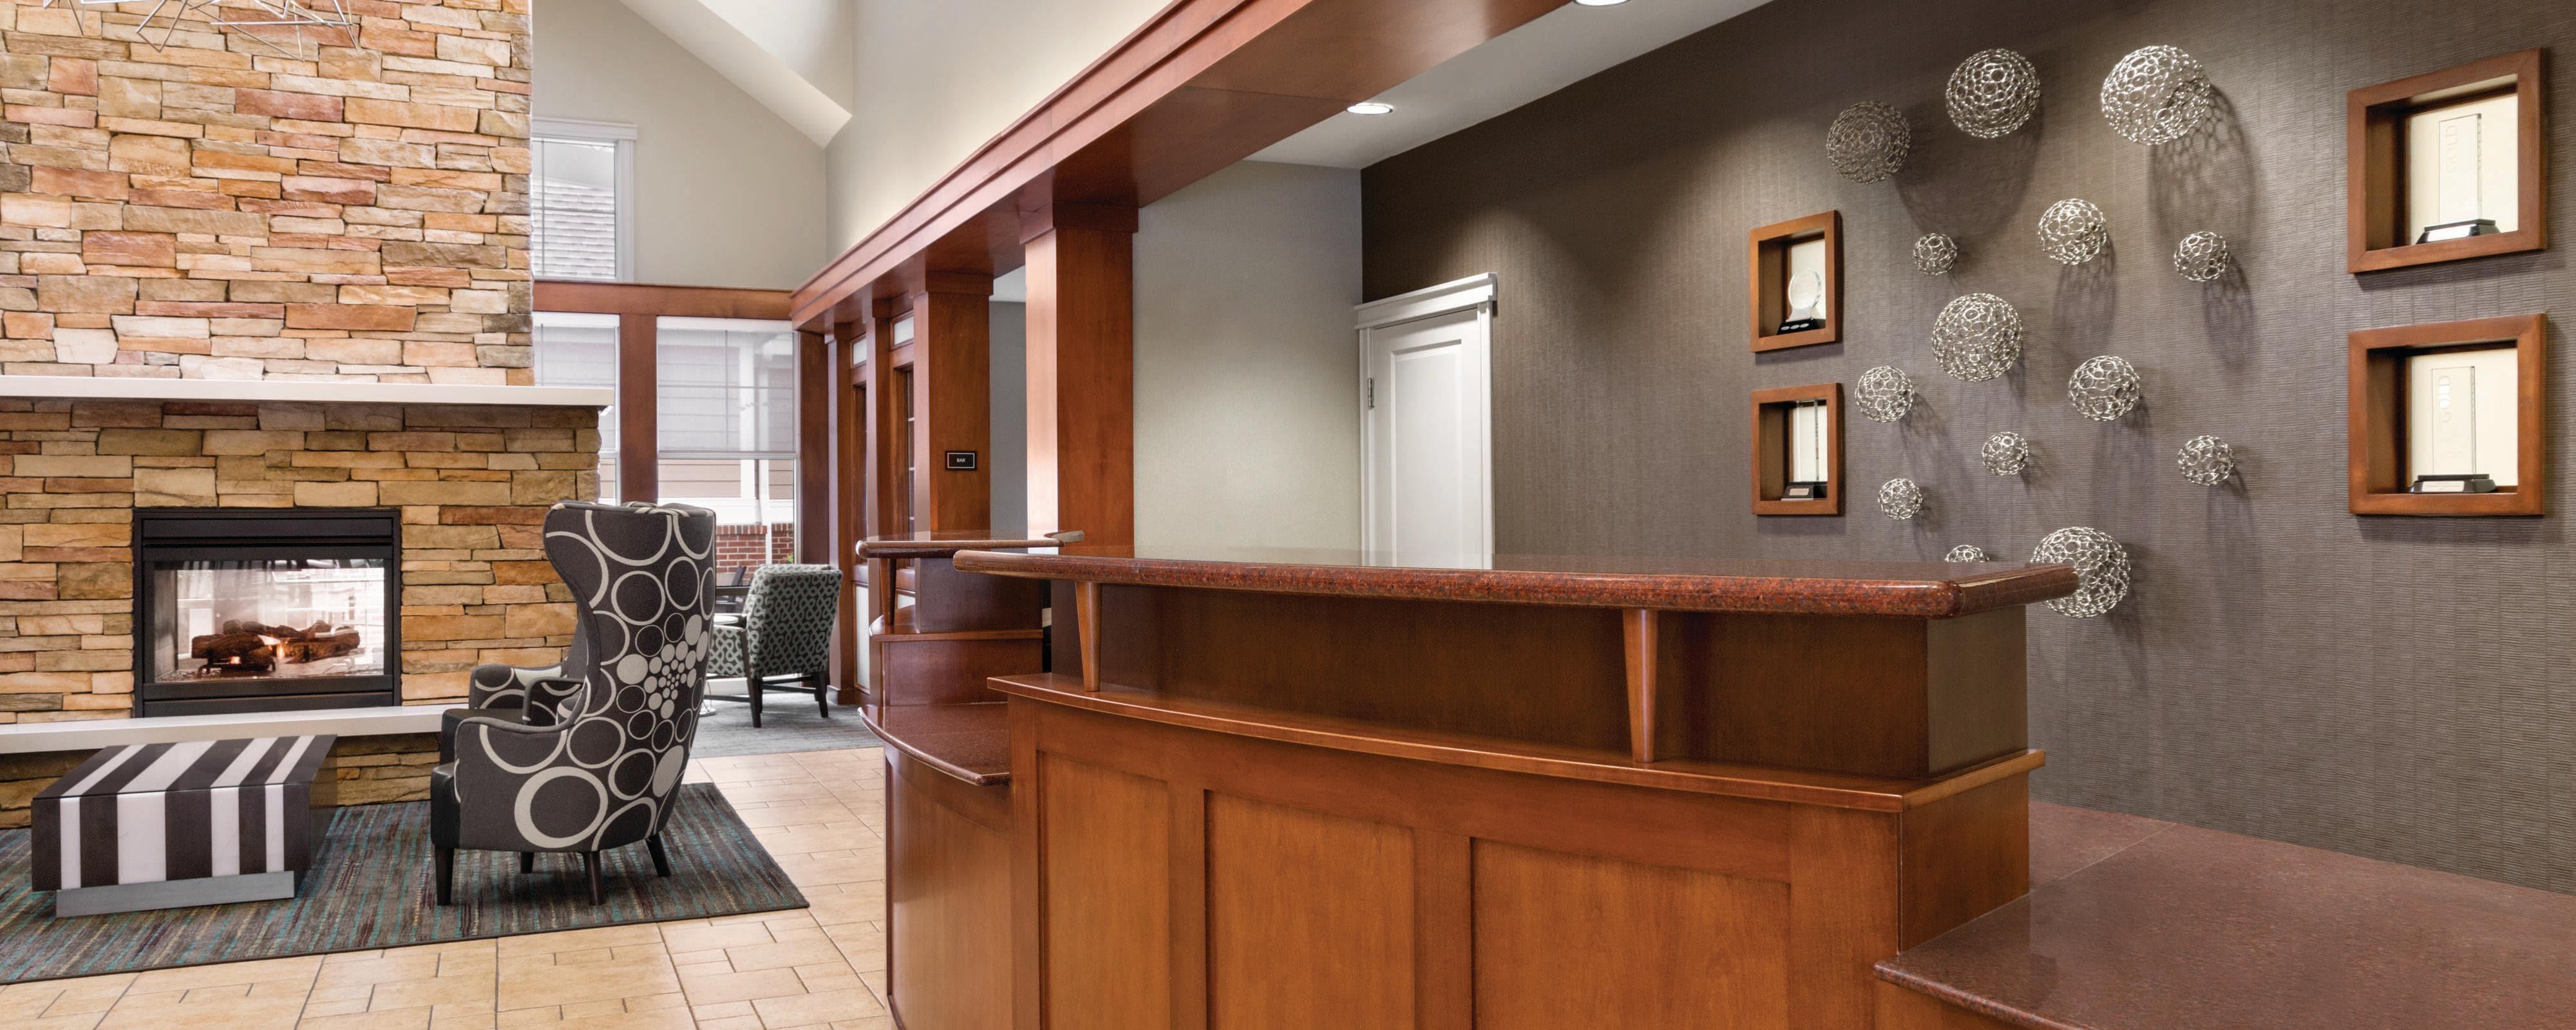 hotel amenities contact information residence inn newport middletown rh marriott com